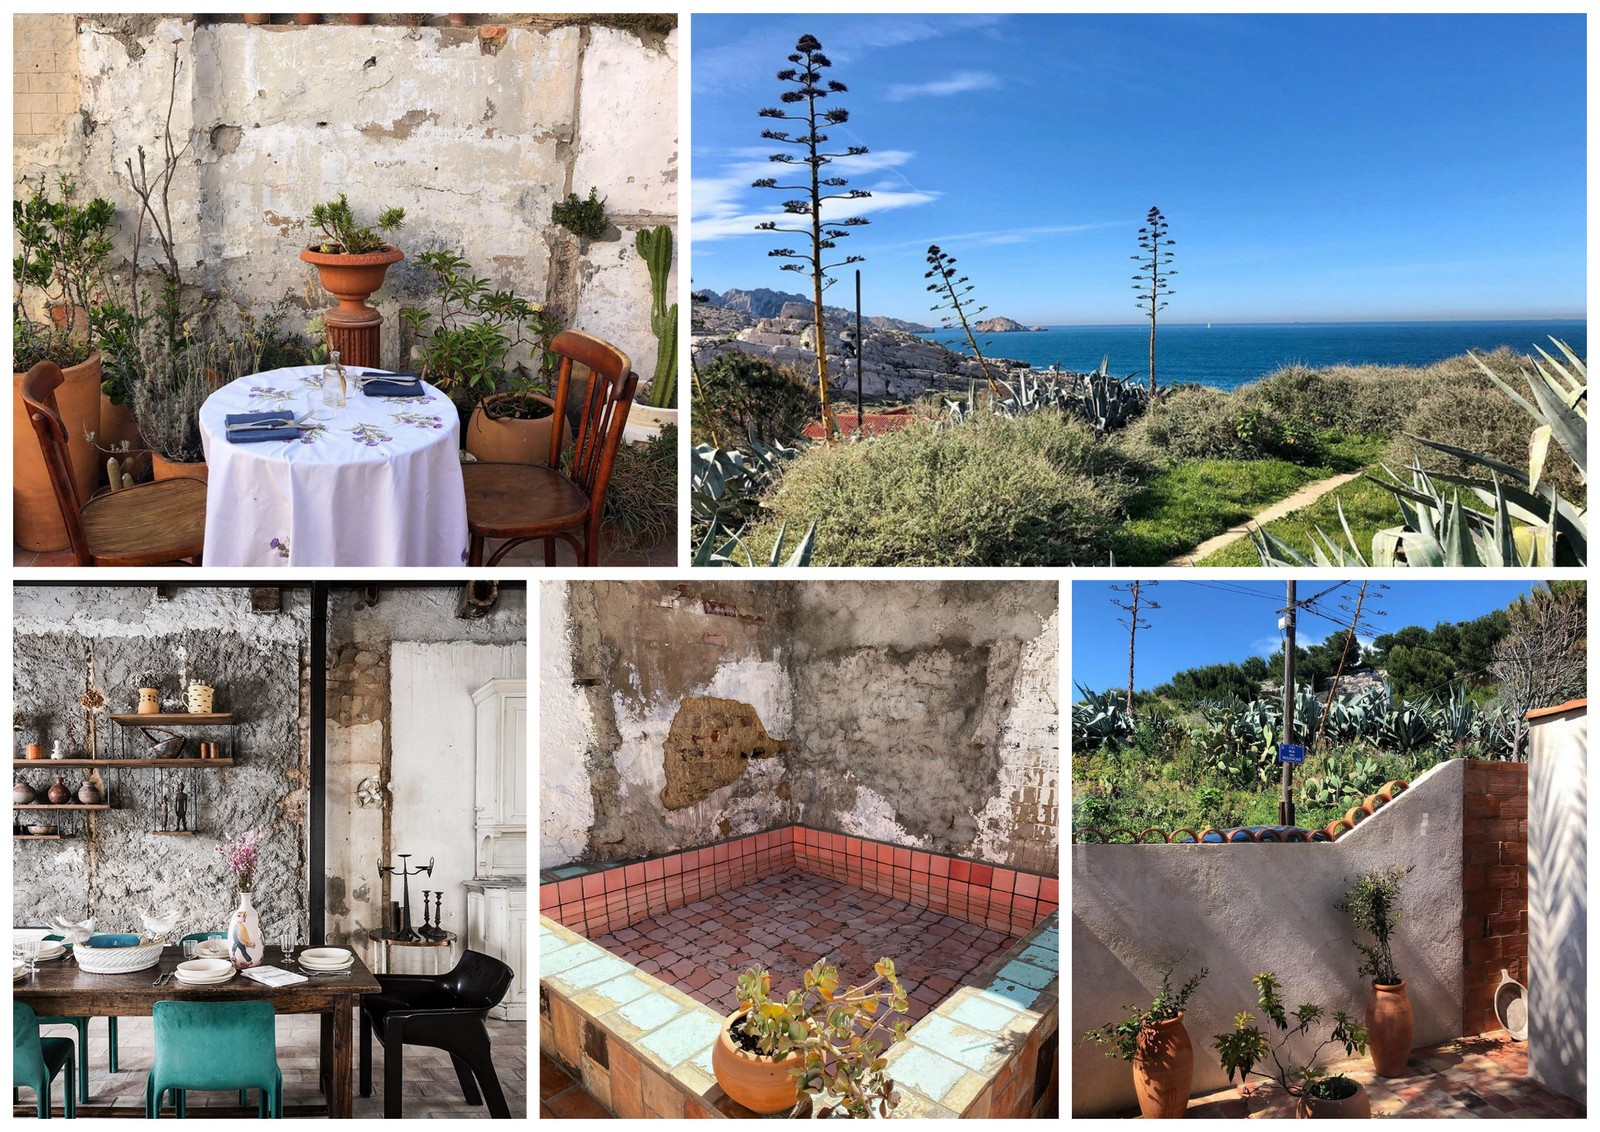 jogging marseille,marseille,jogging samena,calanque amena,airbnb,logement,travel guide,city guide